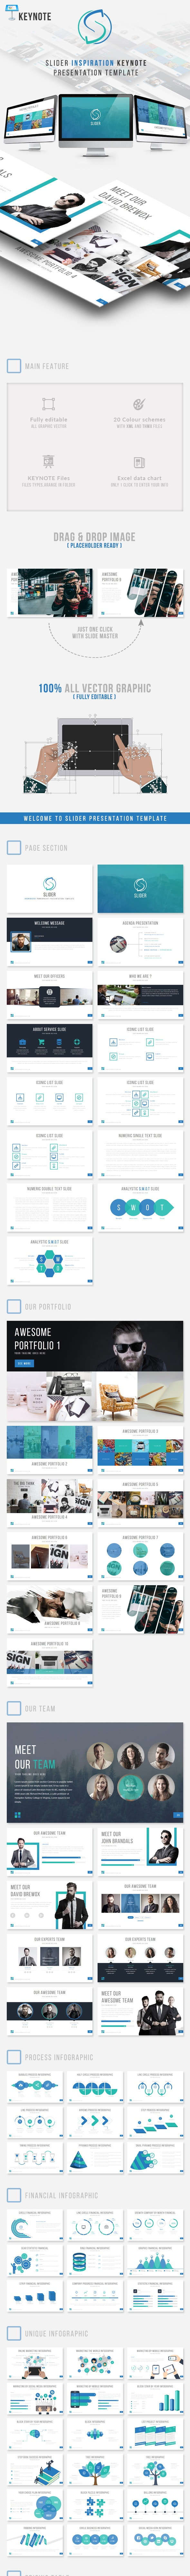 Slider Inspiration Presentation Keynote Template - Business Keynote Templates